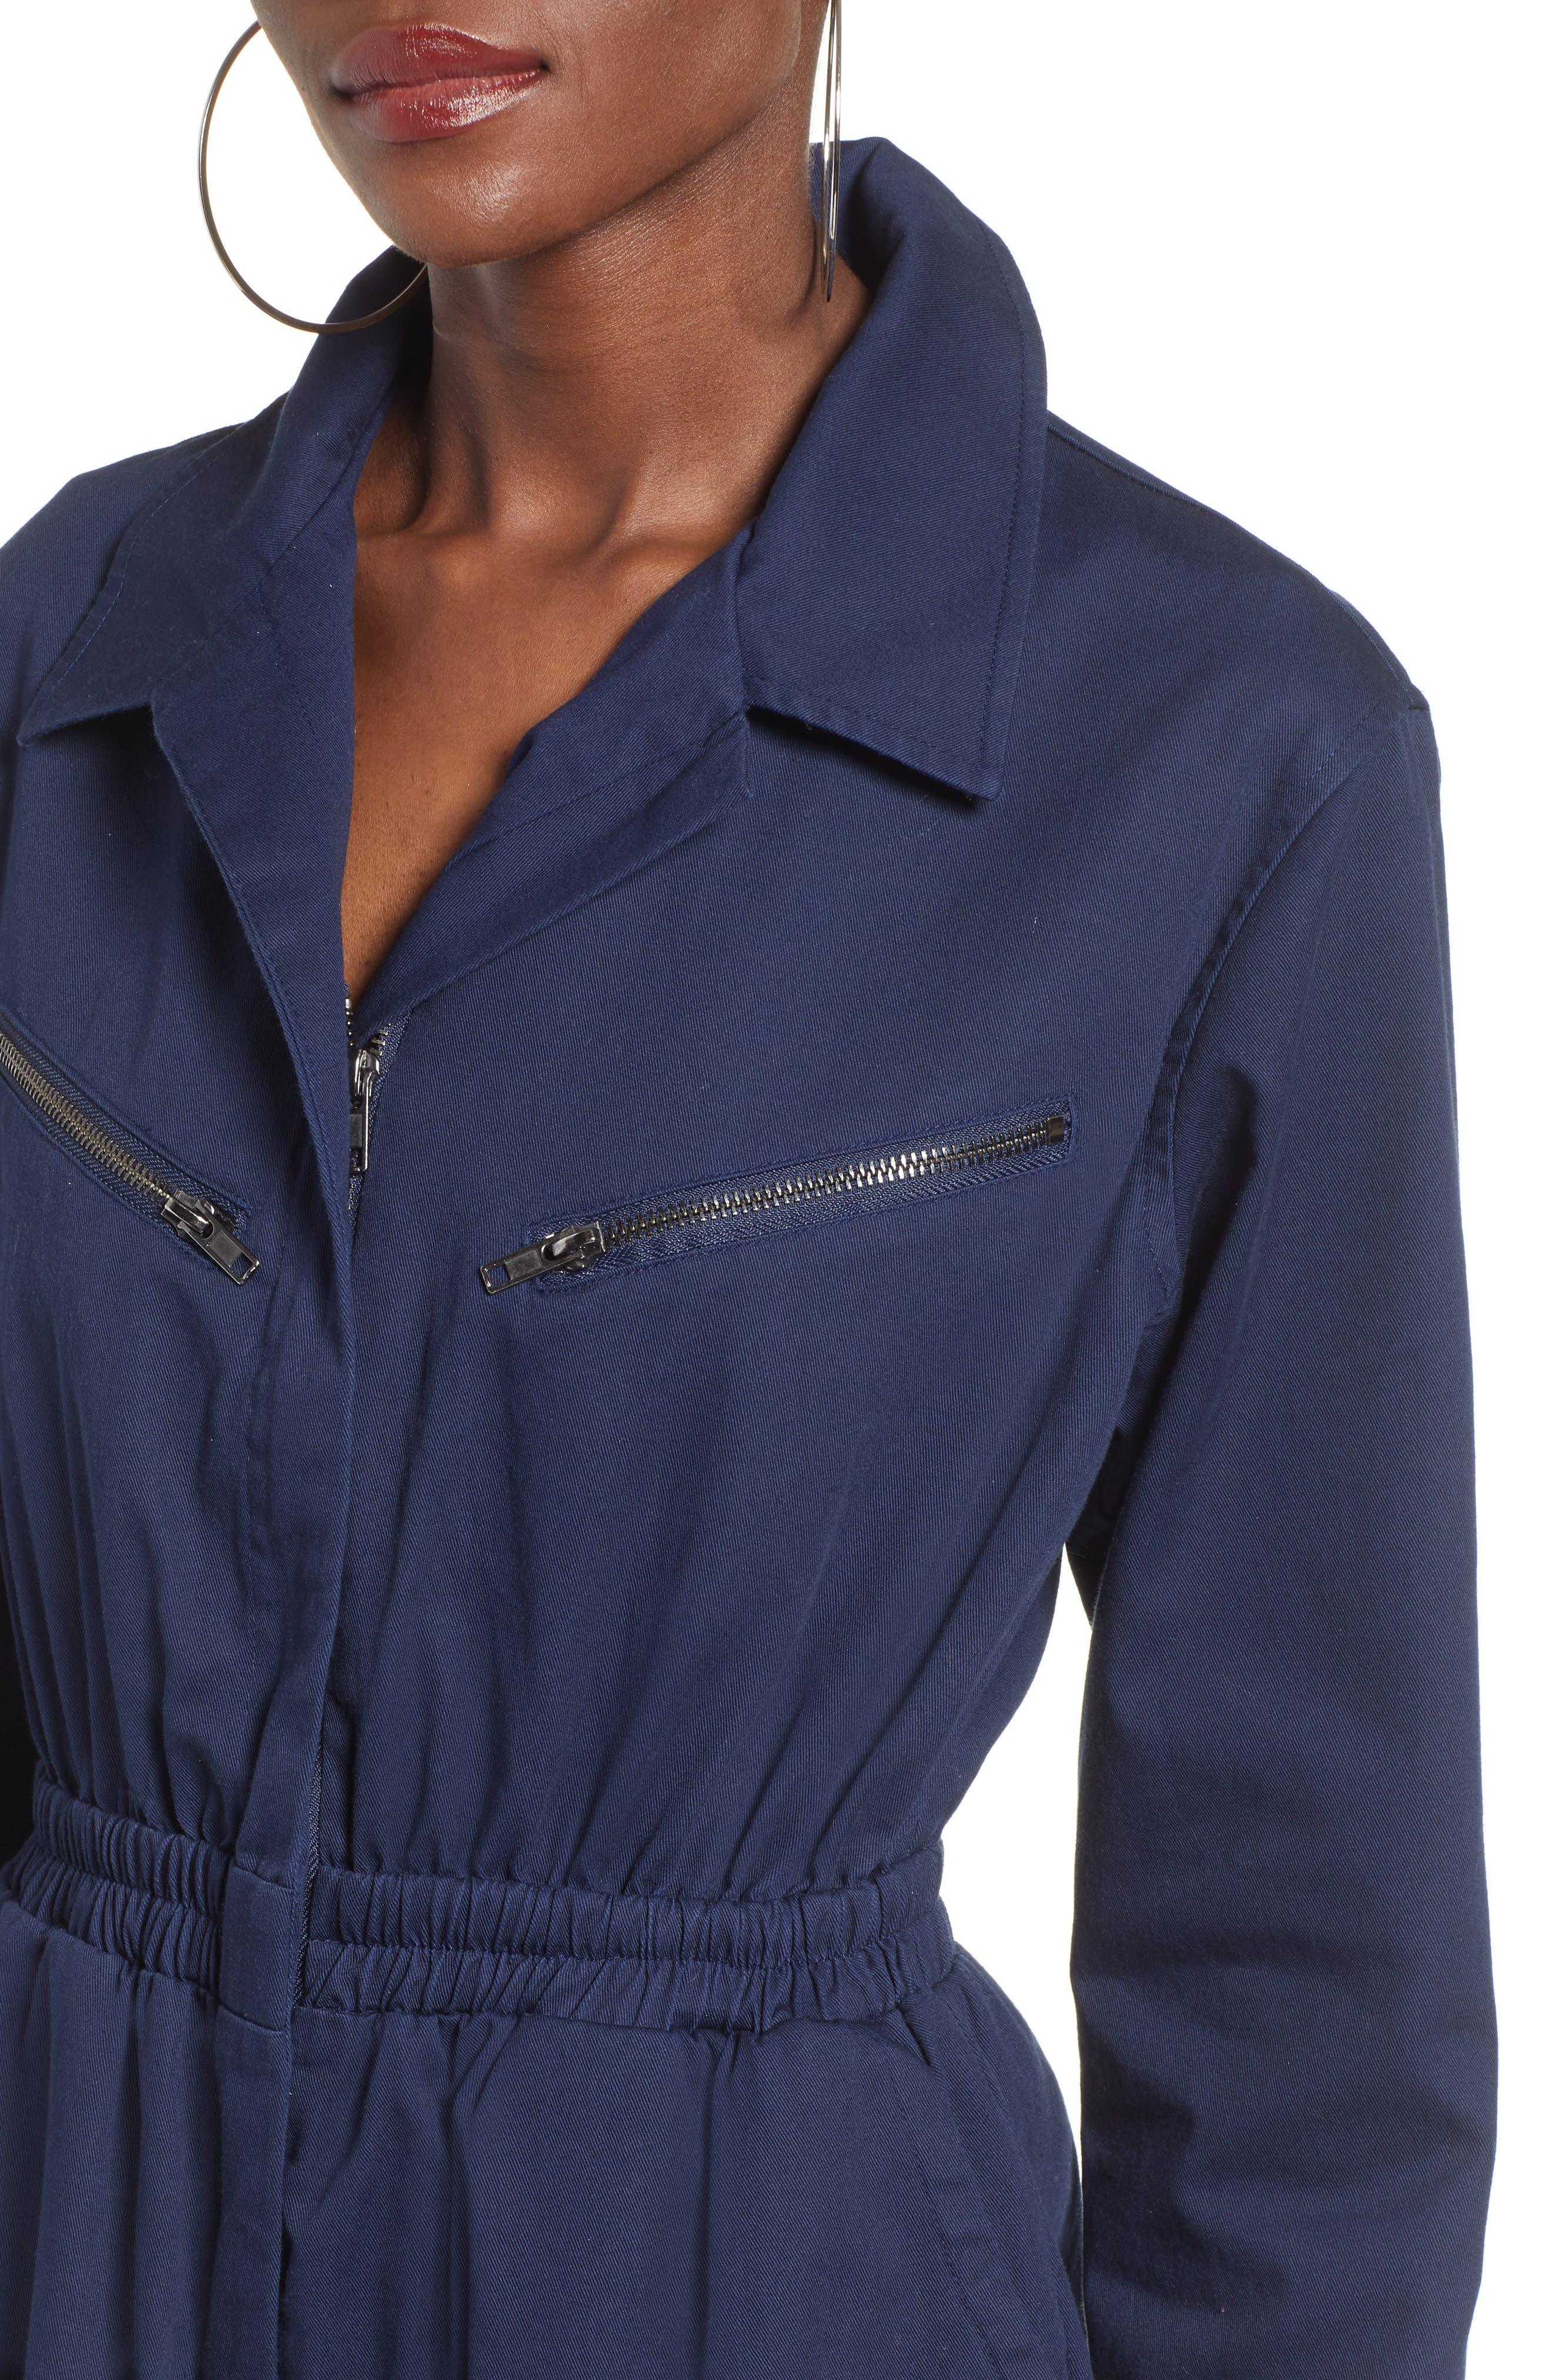 TEN SIXTY SHERMAN, Twill Workwear Jumpsuit, Alternate thumbnail 5, color, 400